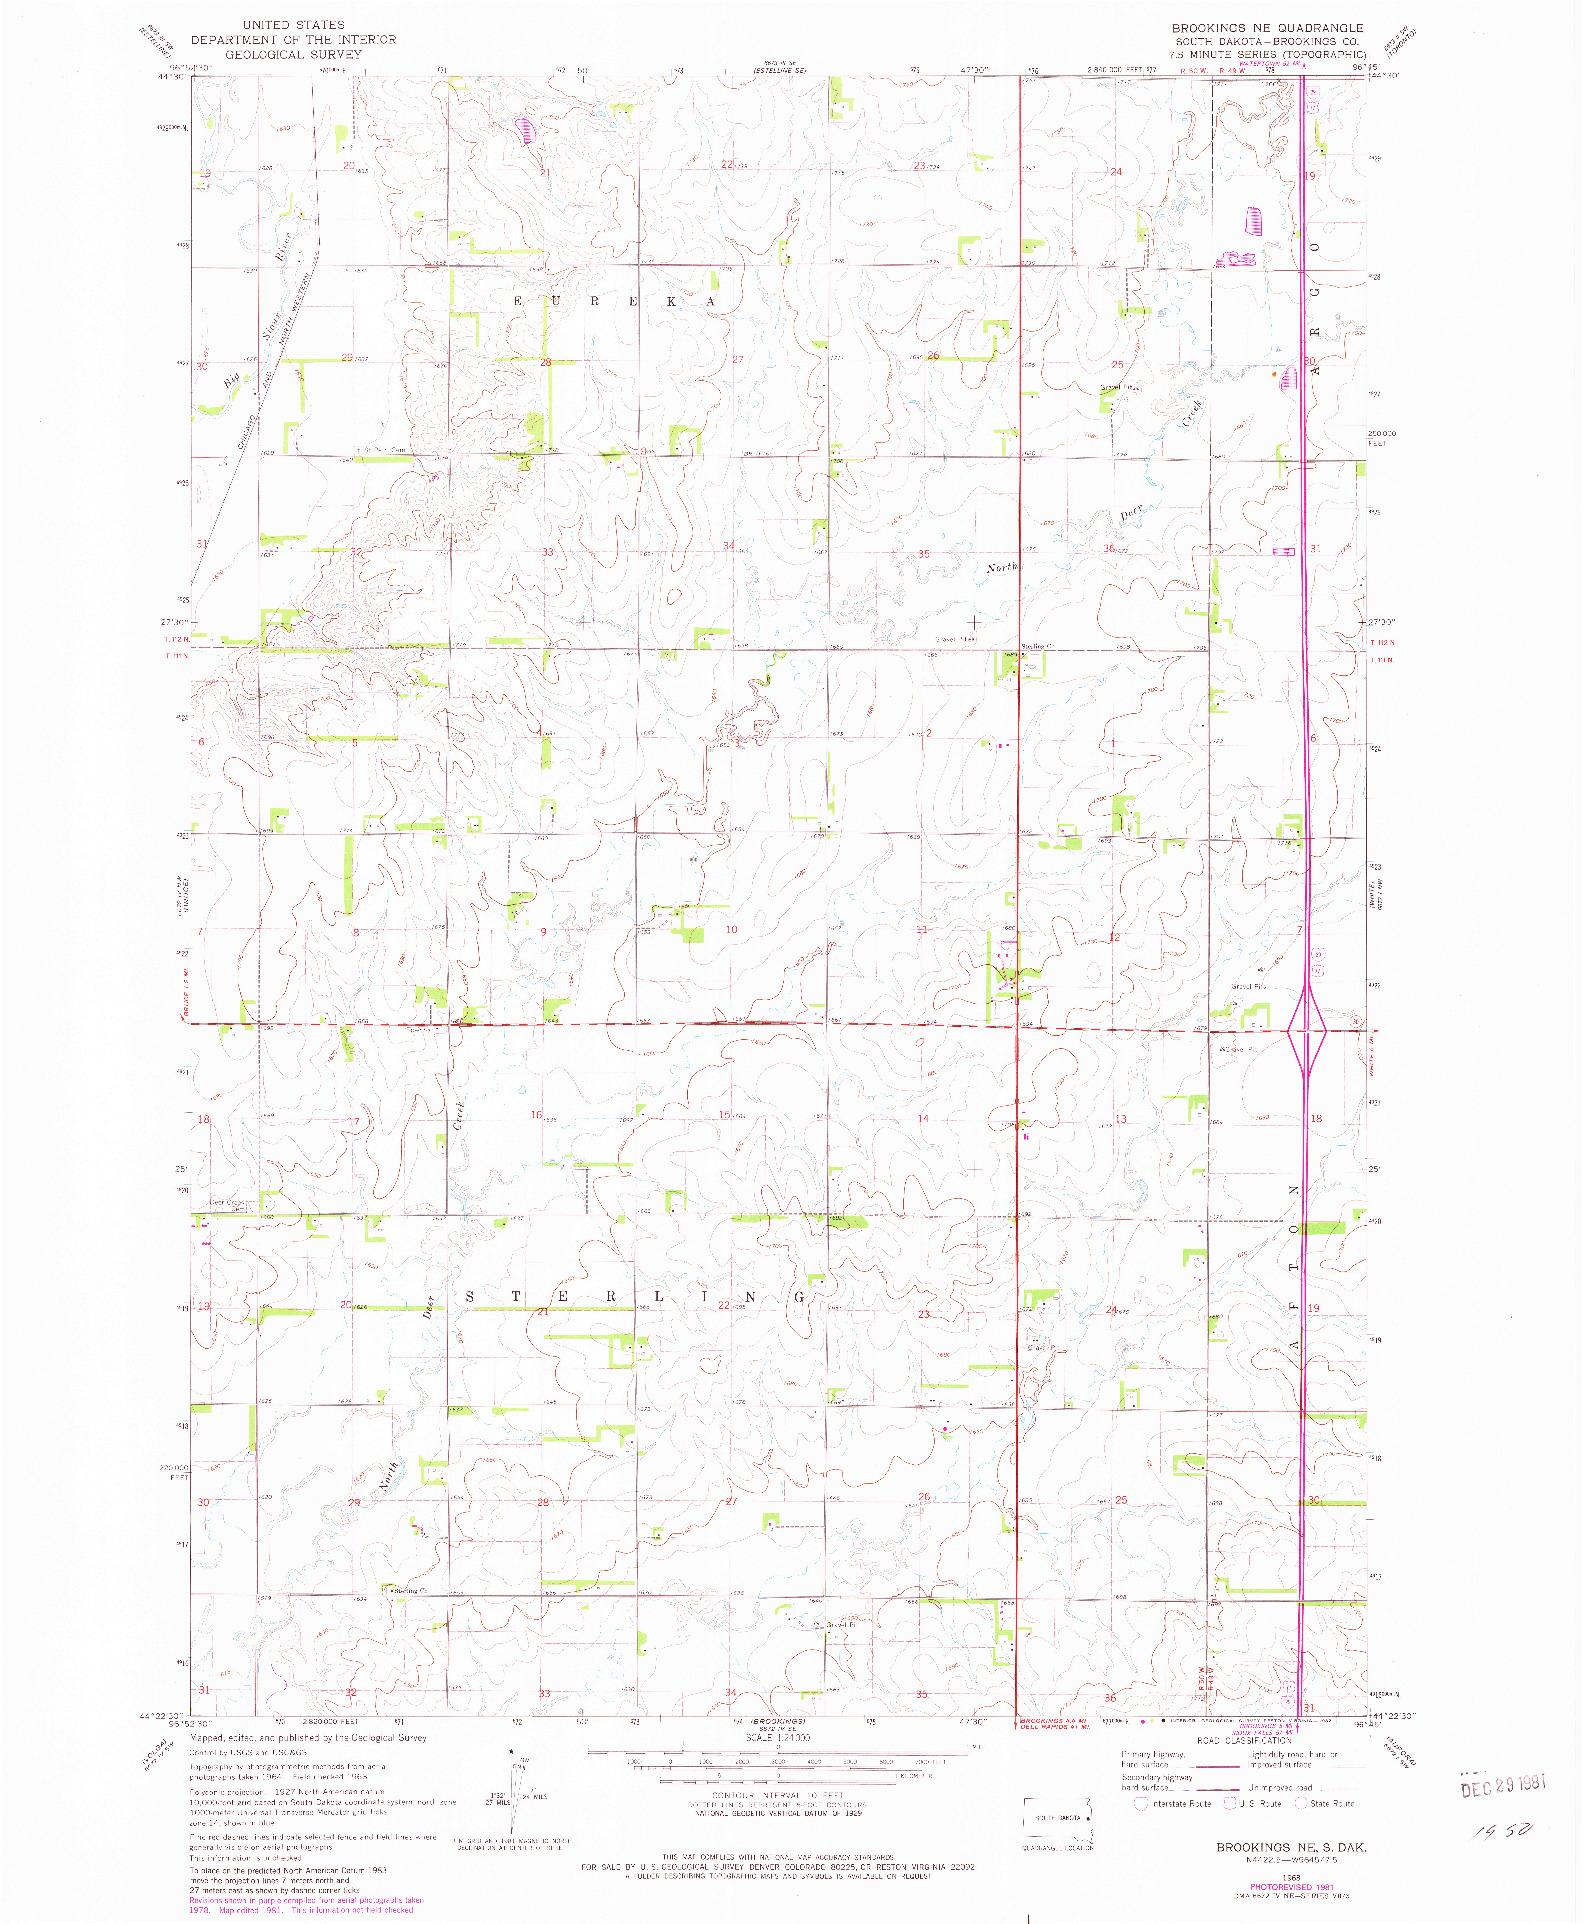 USGS 1:24000-SCALE QUADRANGLE FOR BROOKINGS NE, SD 1968